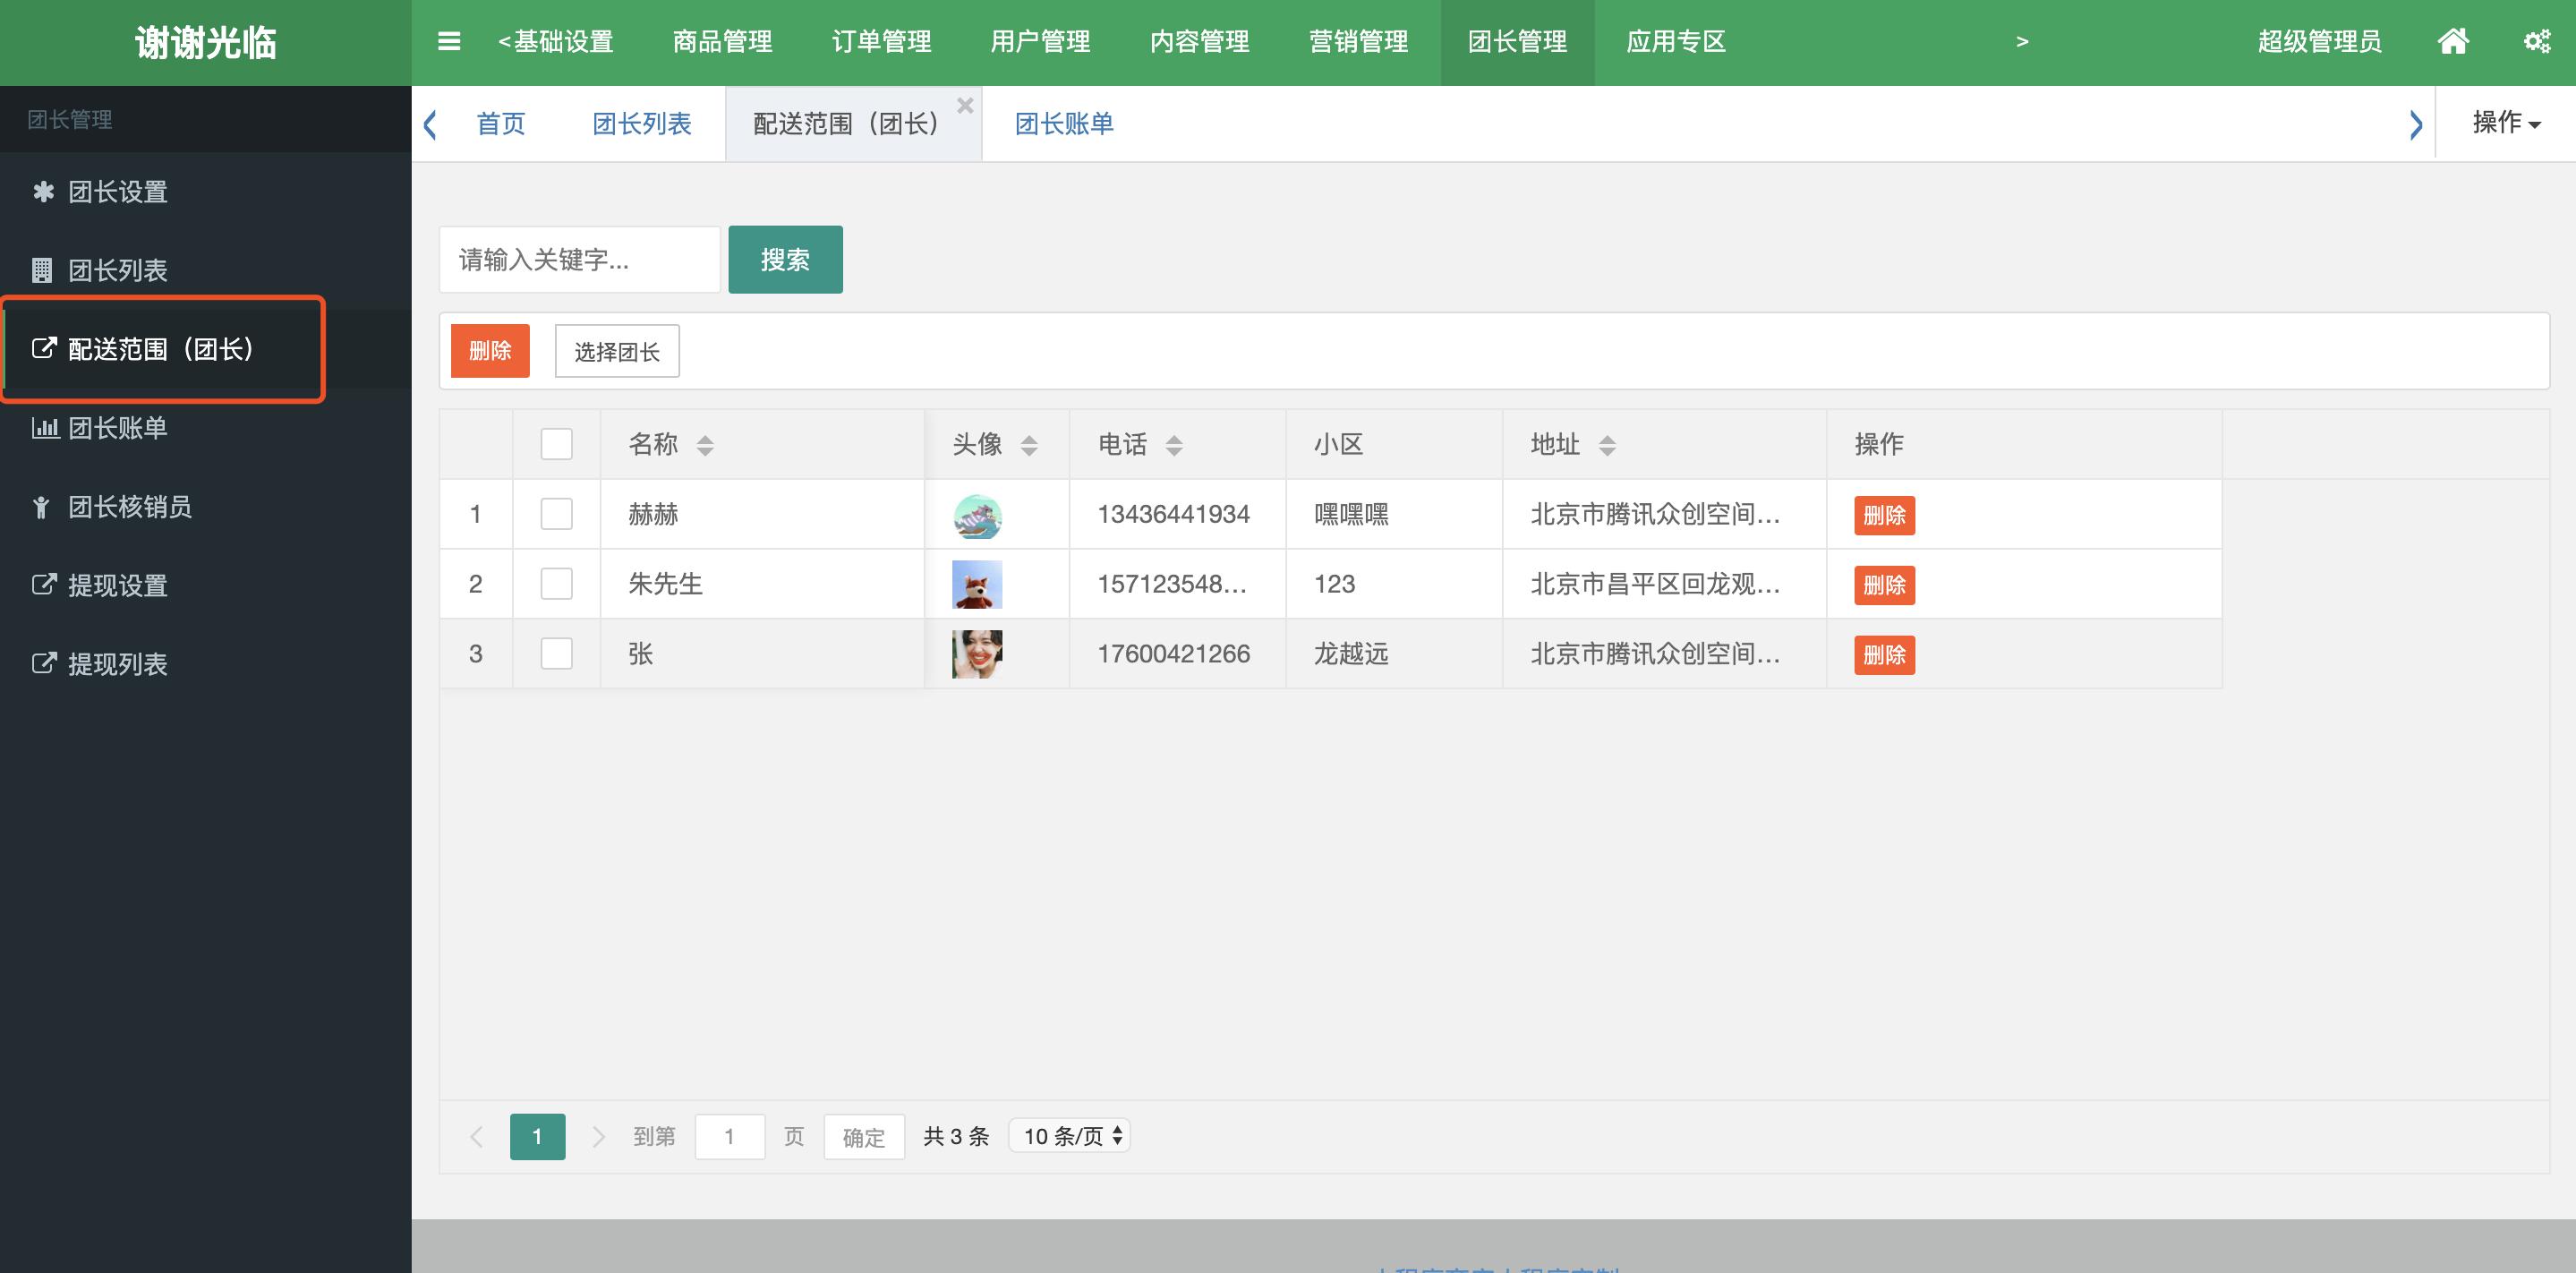 ../../Downloads/社区团购小程序/团长管理/配送范围.png